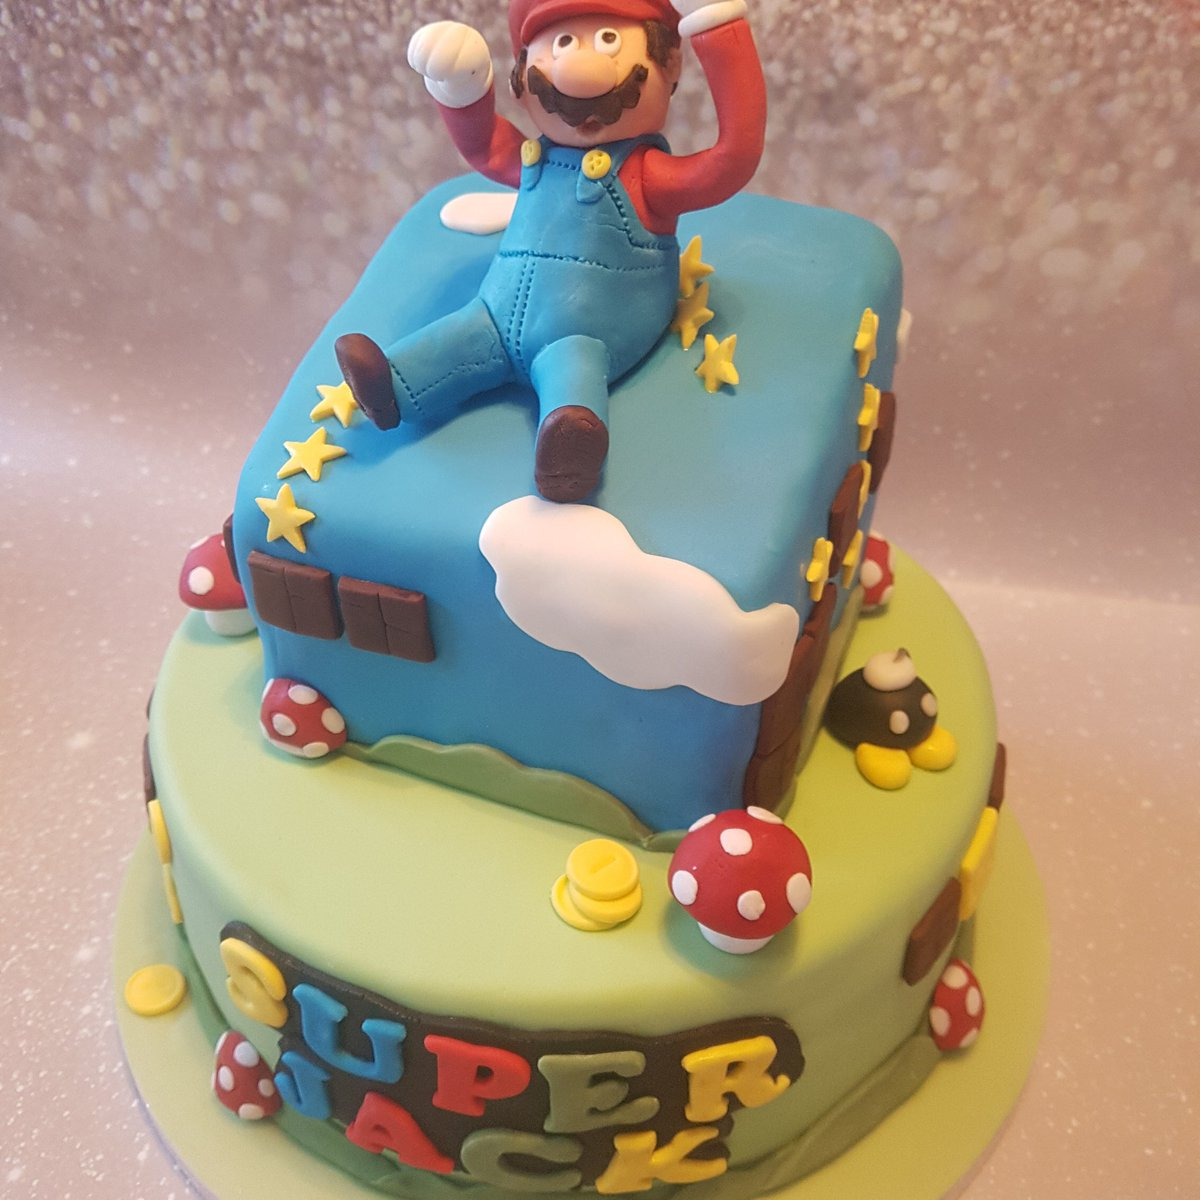 #Cake 🍰 Awesome of the Day: #Geek 🤓 #Nintendo #Mario #Birthdaycake 🎂 for 'Super Jack' via @serenityflorist #SamaGeek #SamaCake